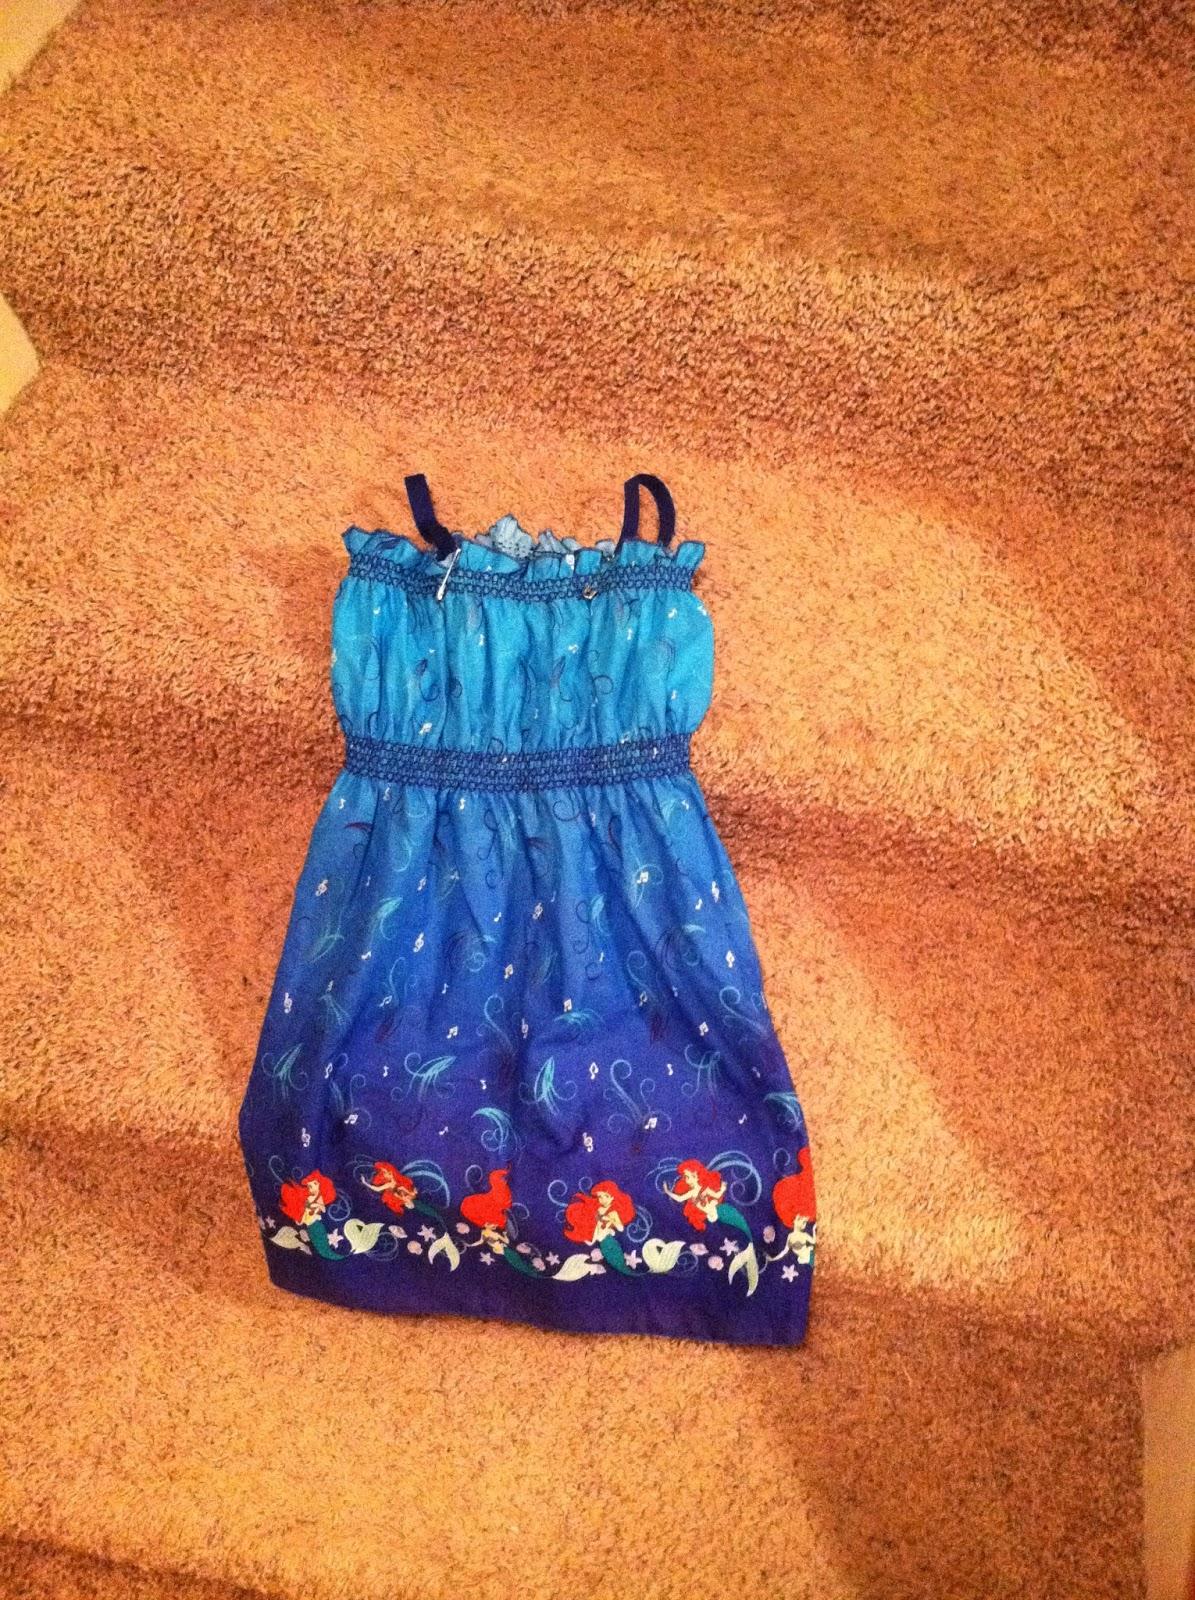 how to sew a mock smock dress, ariel dress